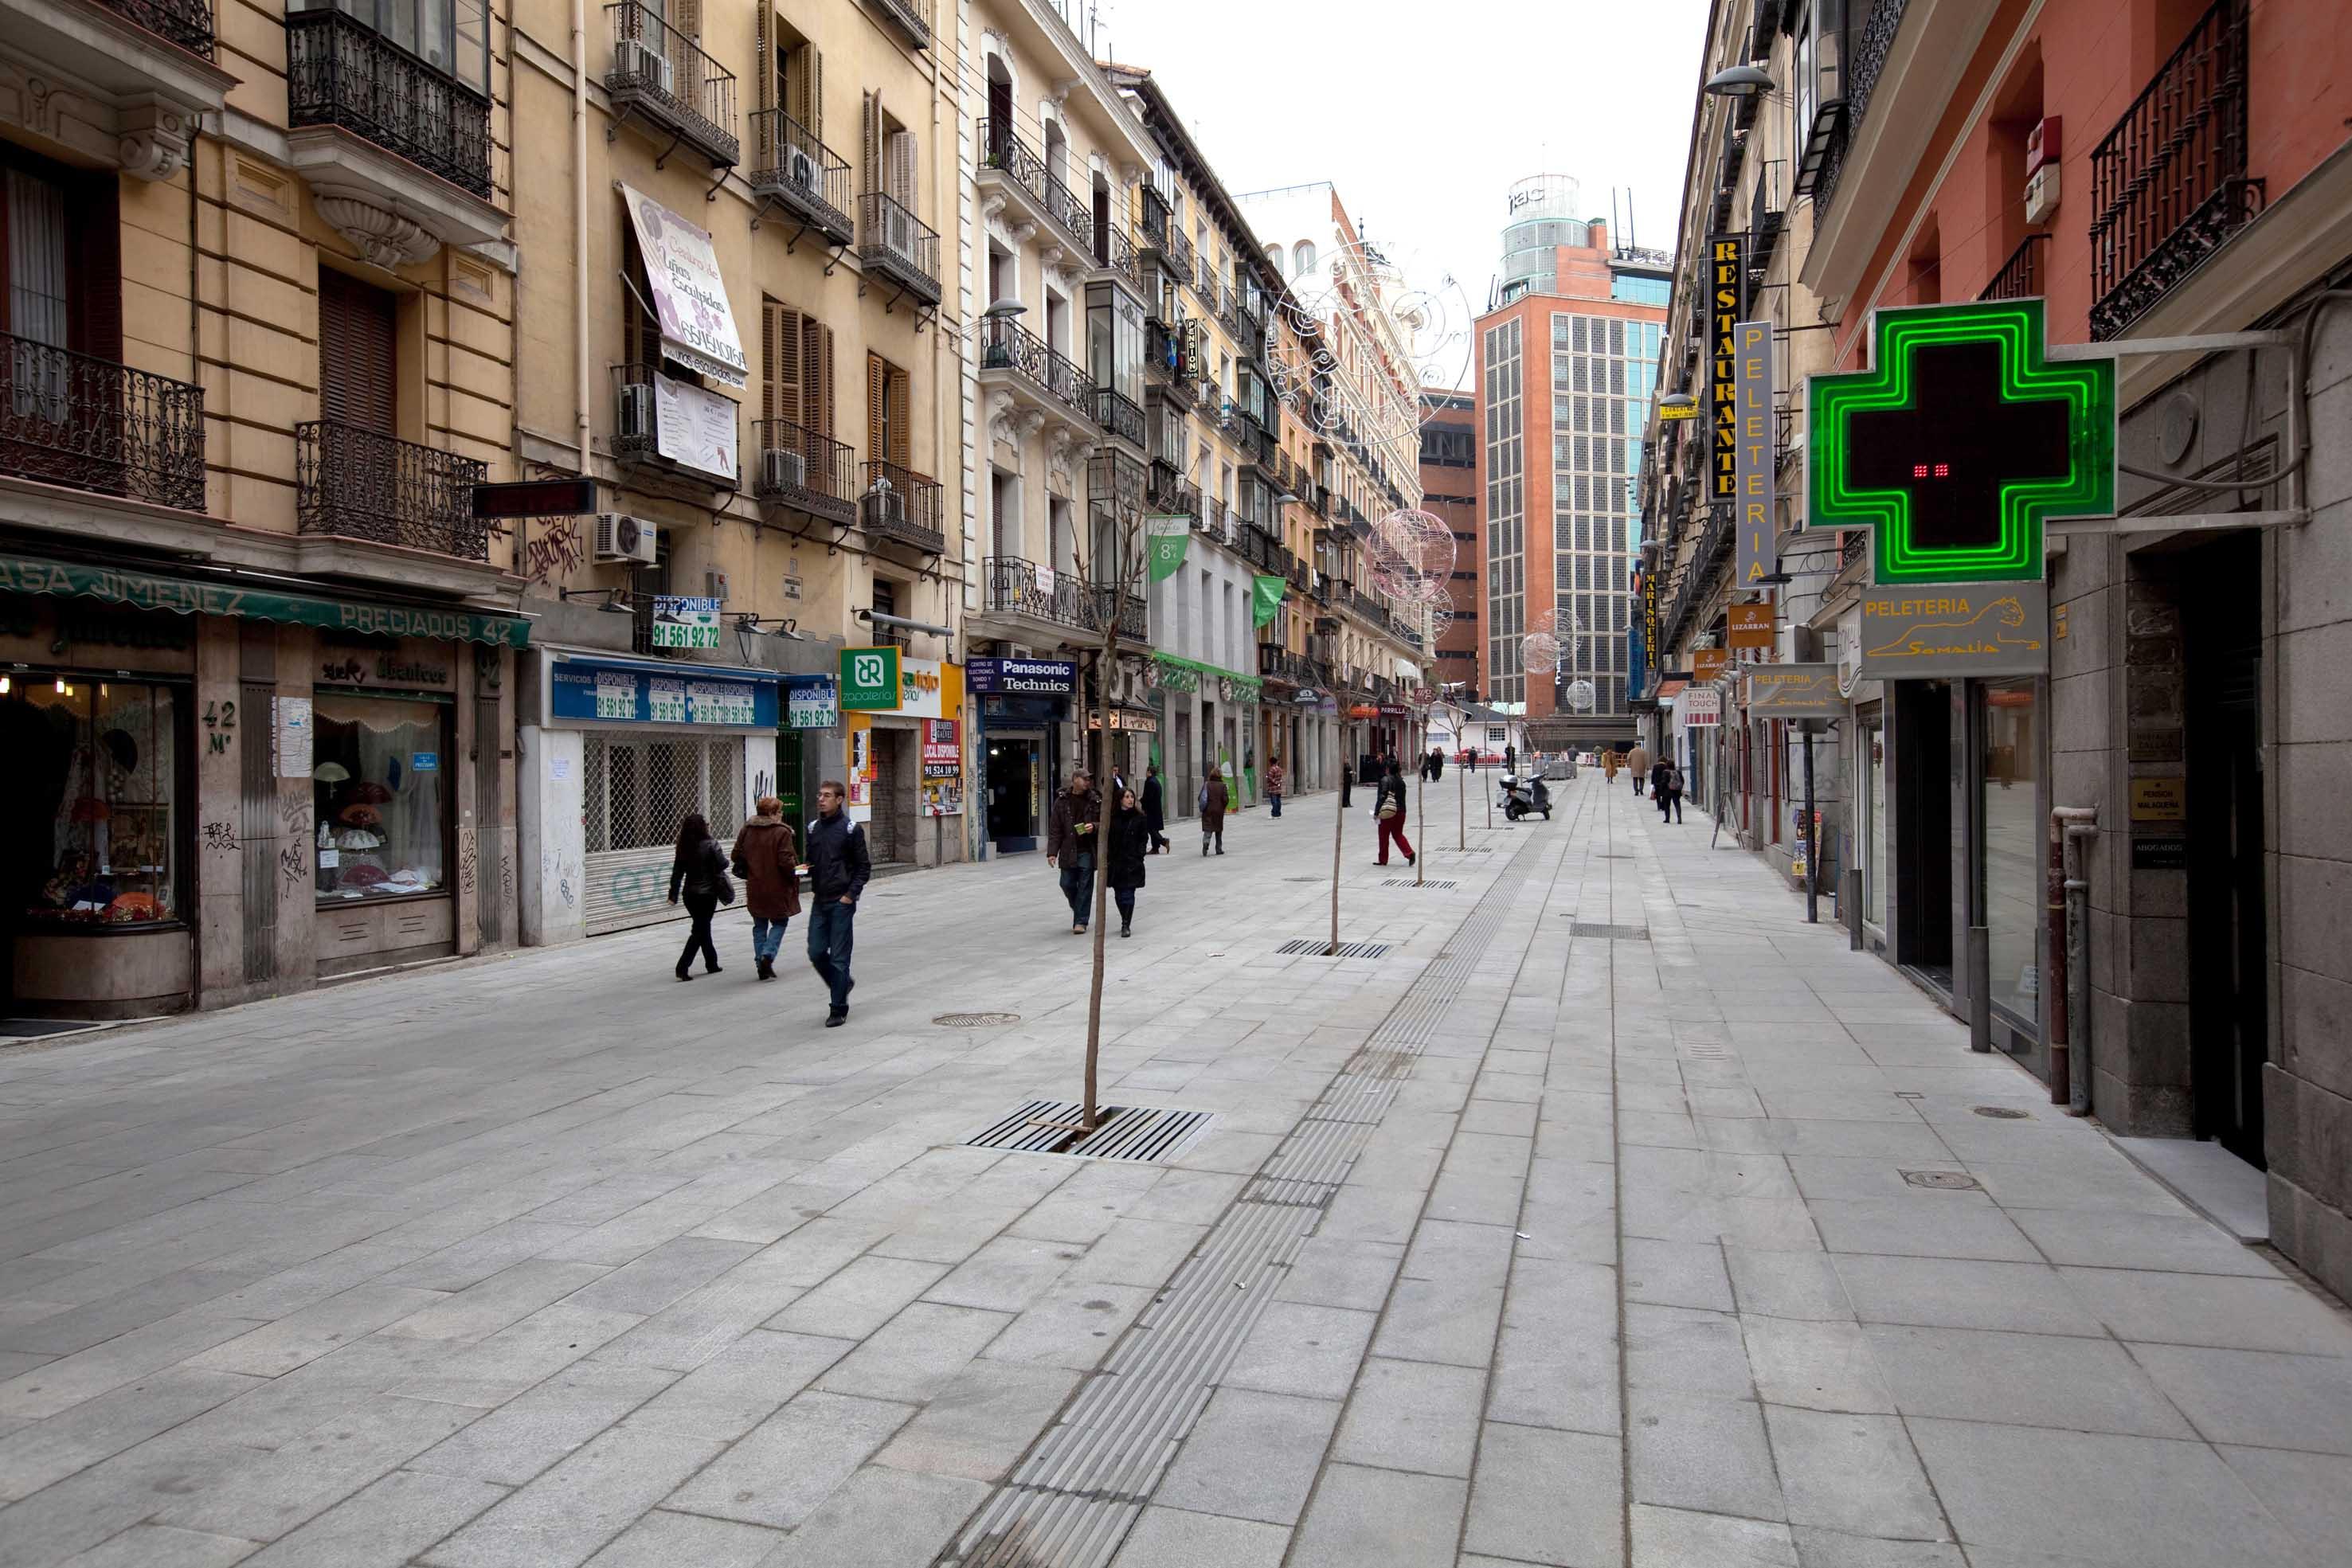 La dimensi n m s humana de callao ayuntamiento de madrid - H m calle orense madrid ...